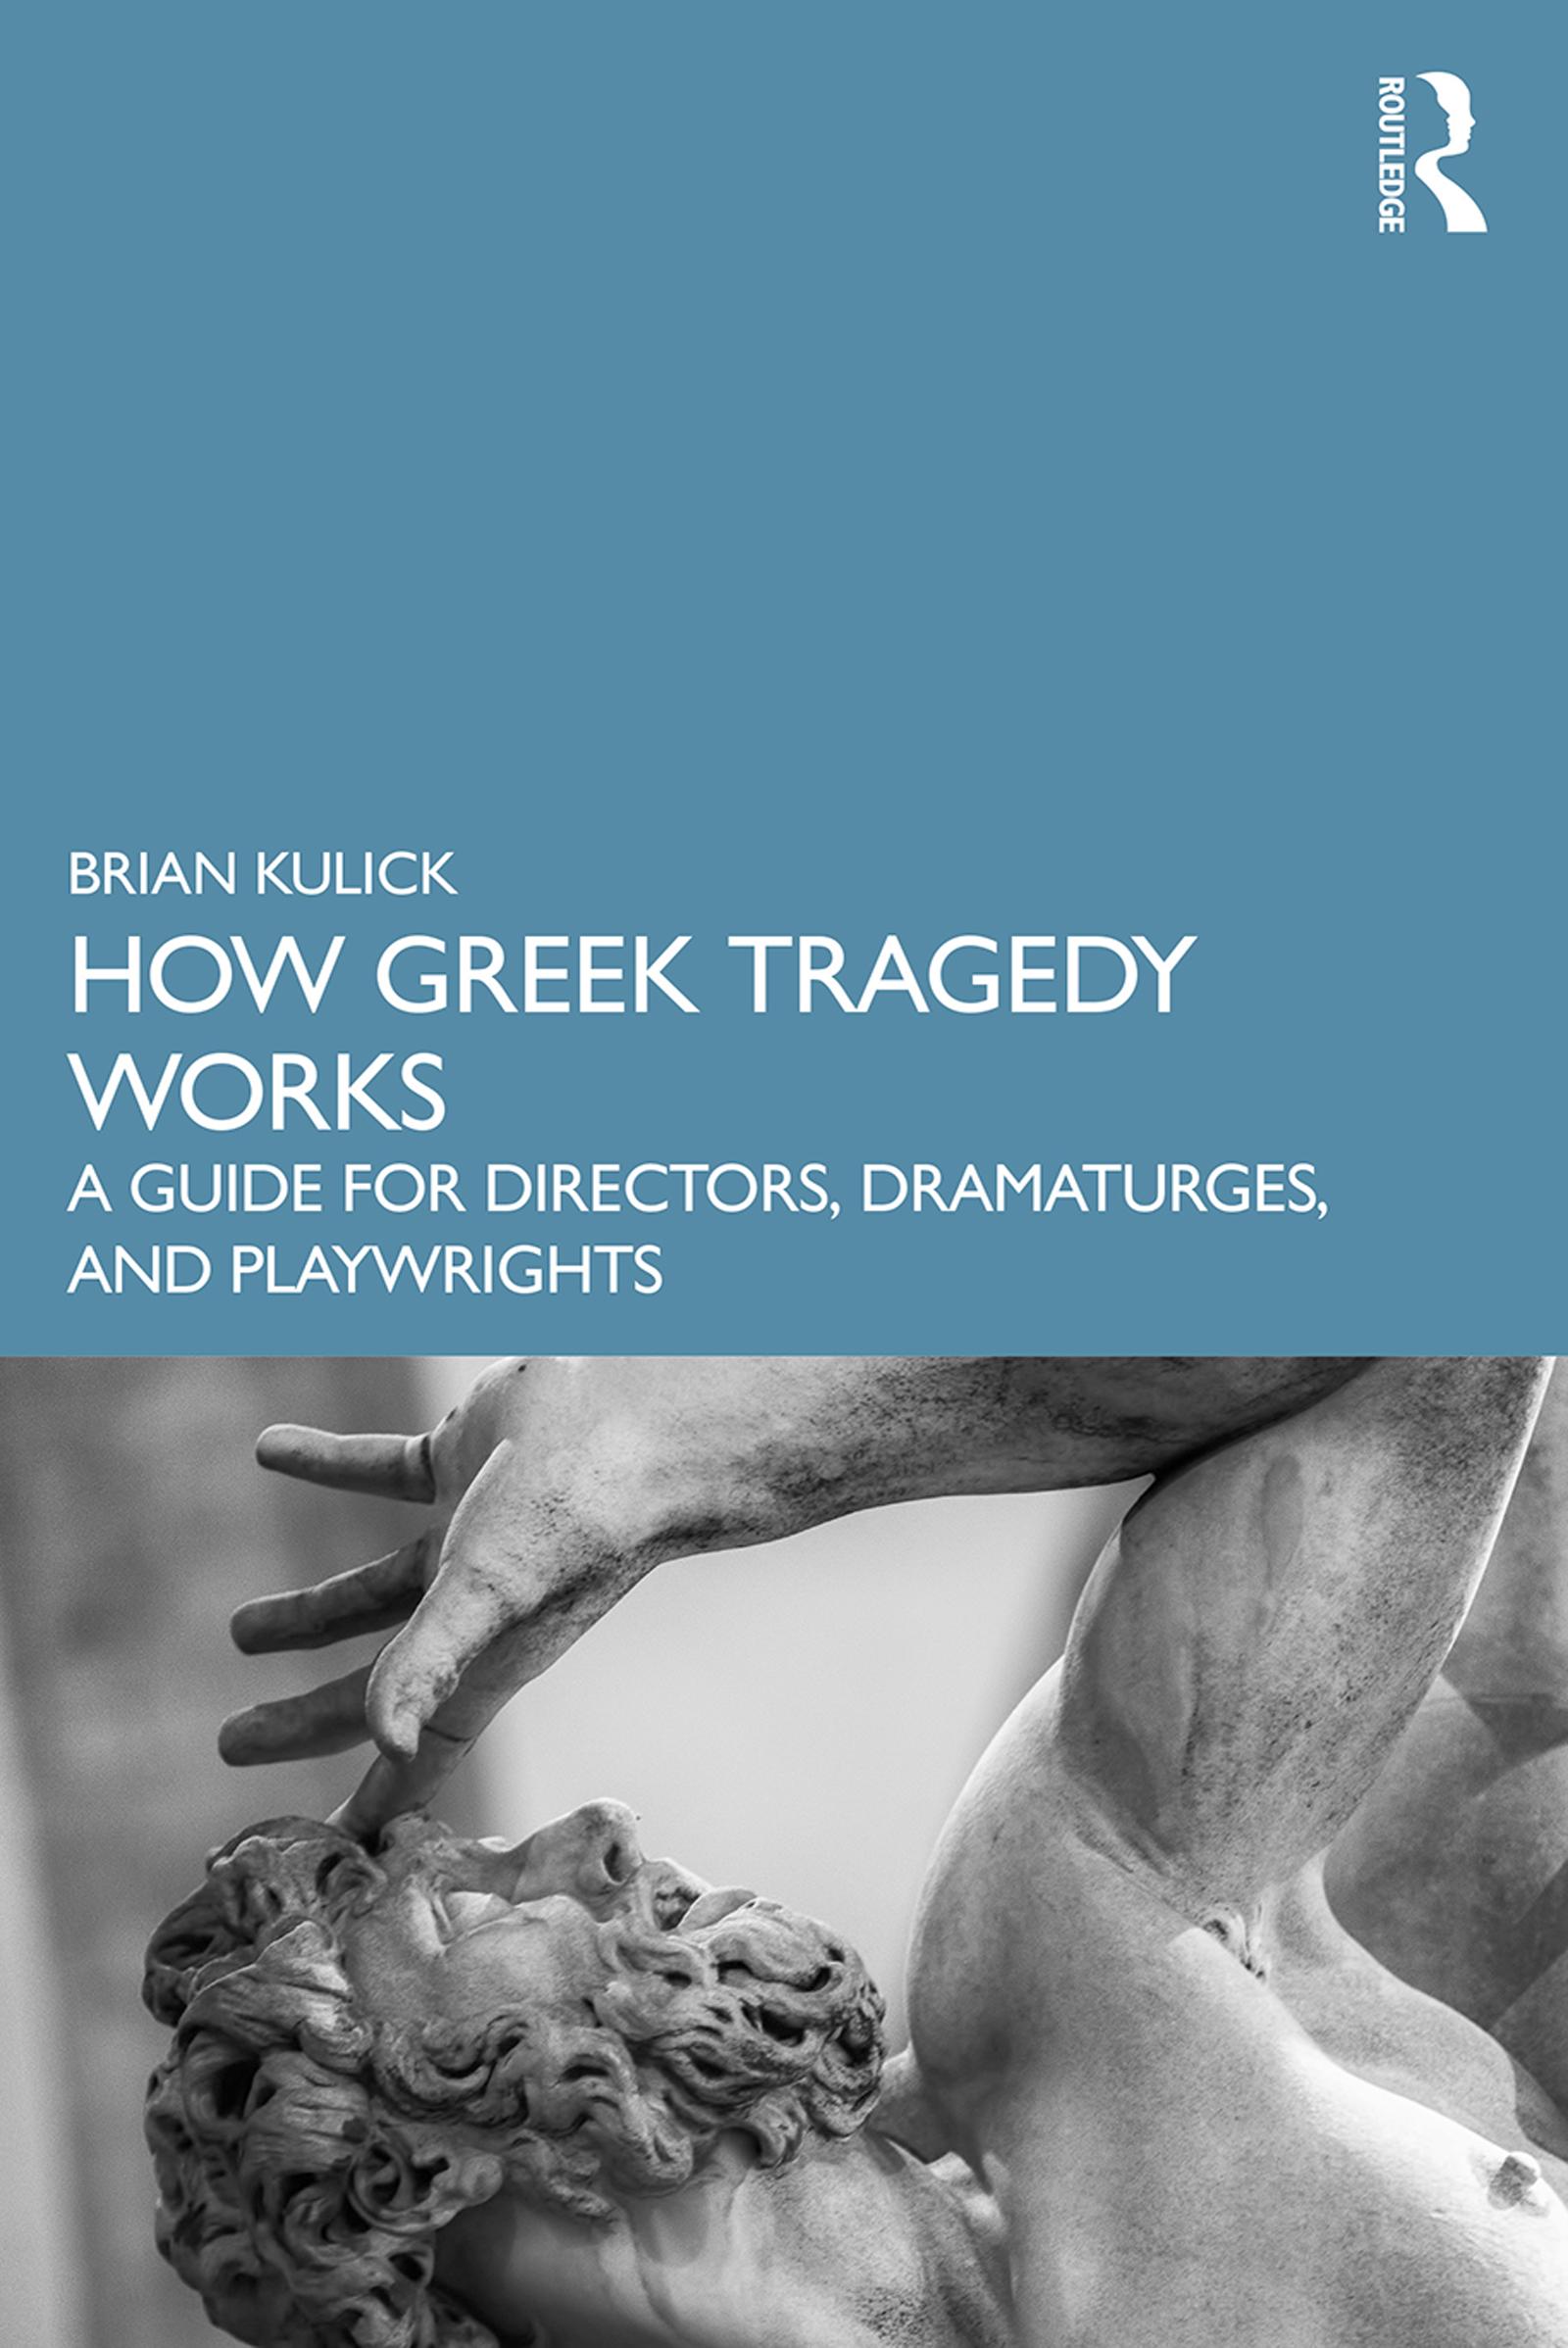 Raising the dead; or, theatre as thanatology